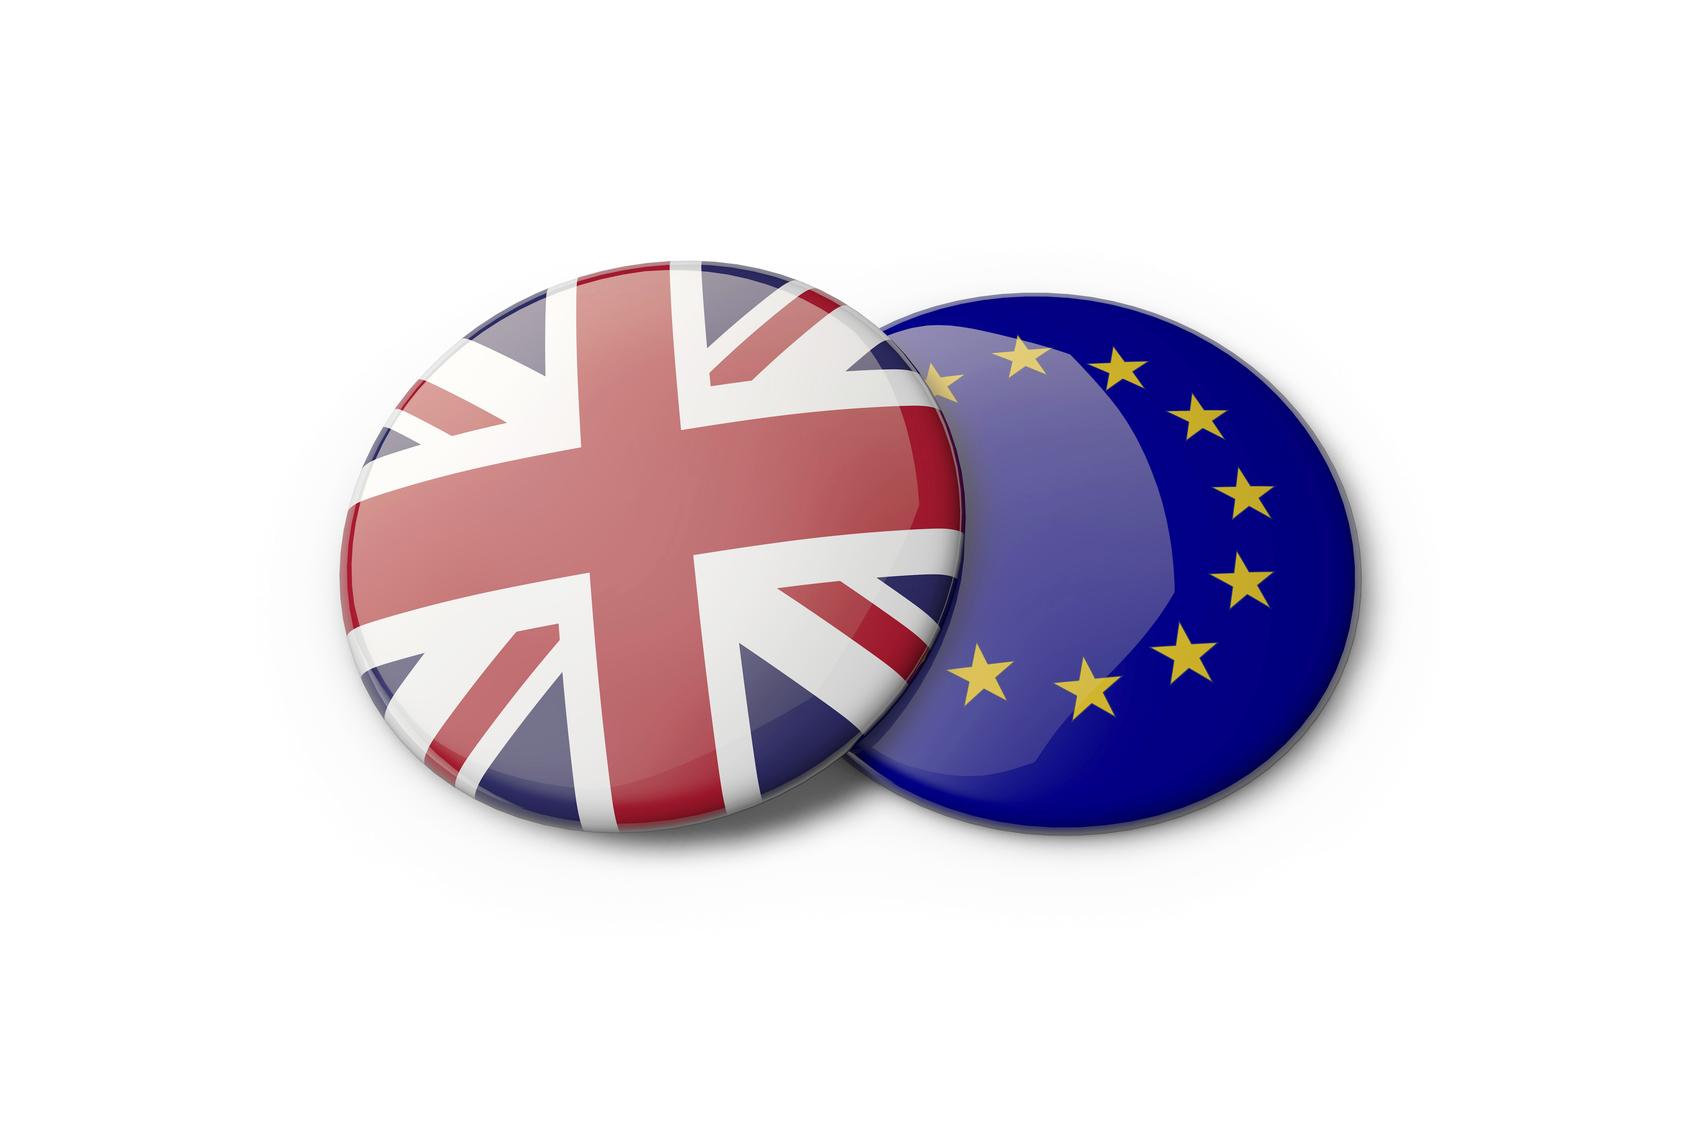 EU and UK badges